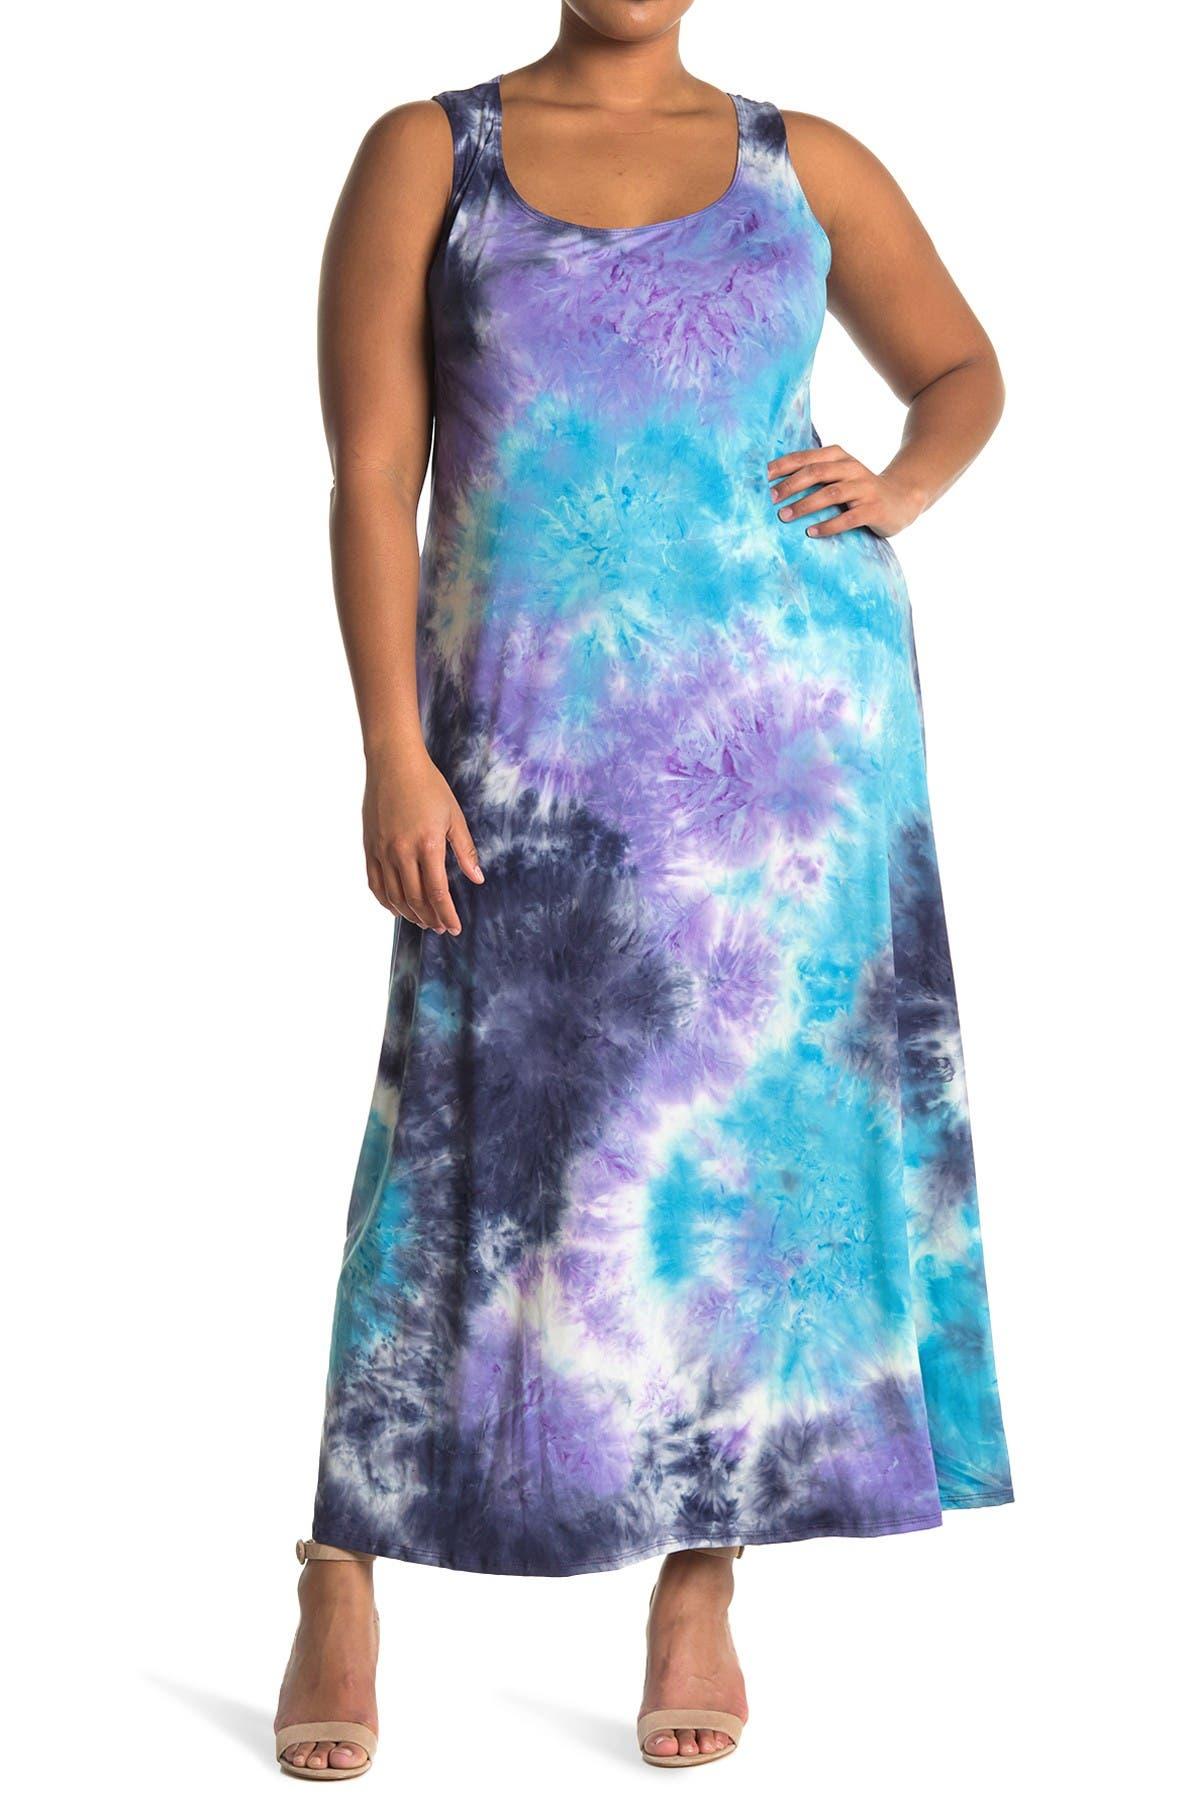 Image of TASH + SOPHIE Sleeveless Tie Dye Maxi Dress